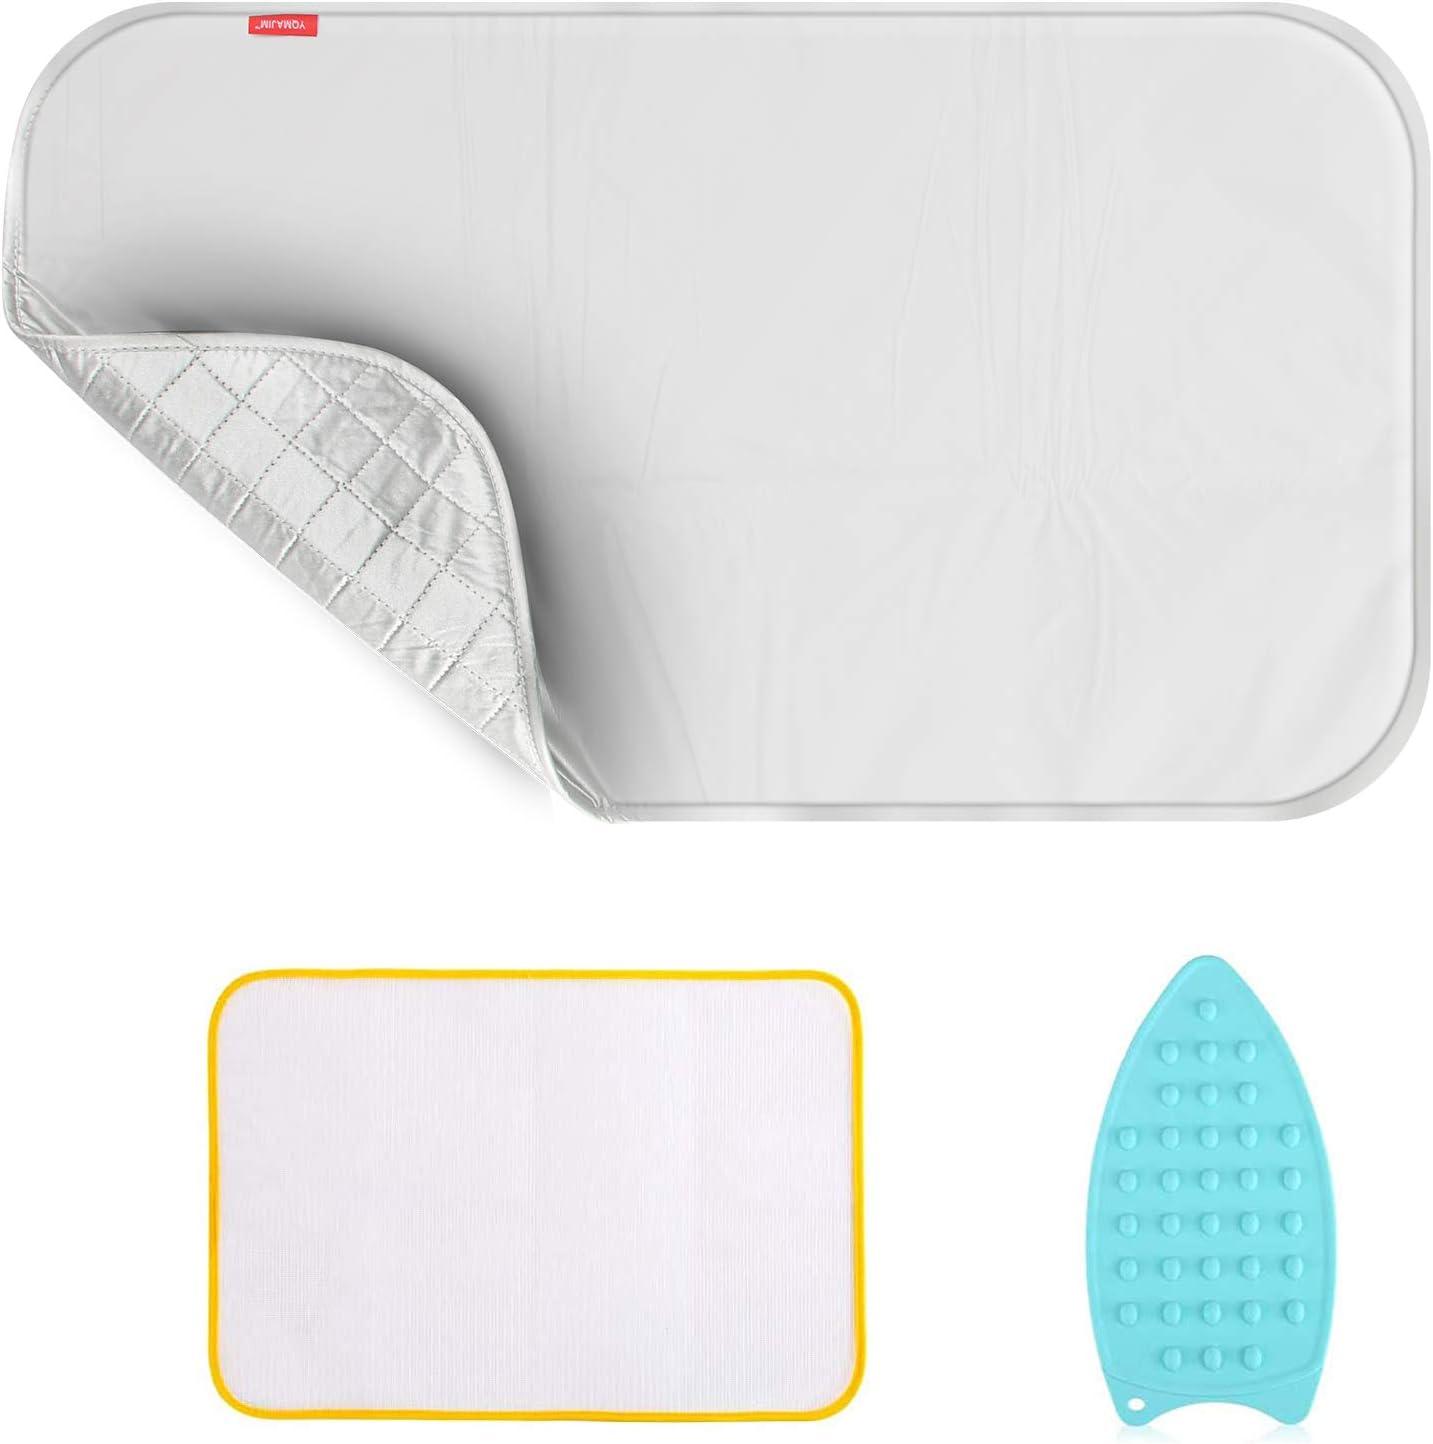 YQMAJIM Ironing Blanket Ironing Mat Portable Travel Ironing Pad